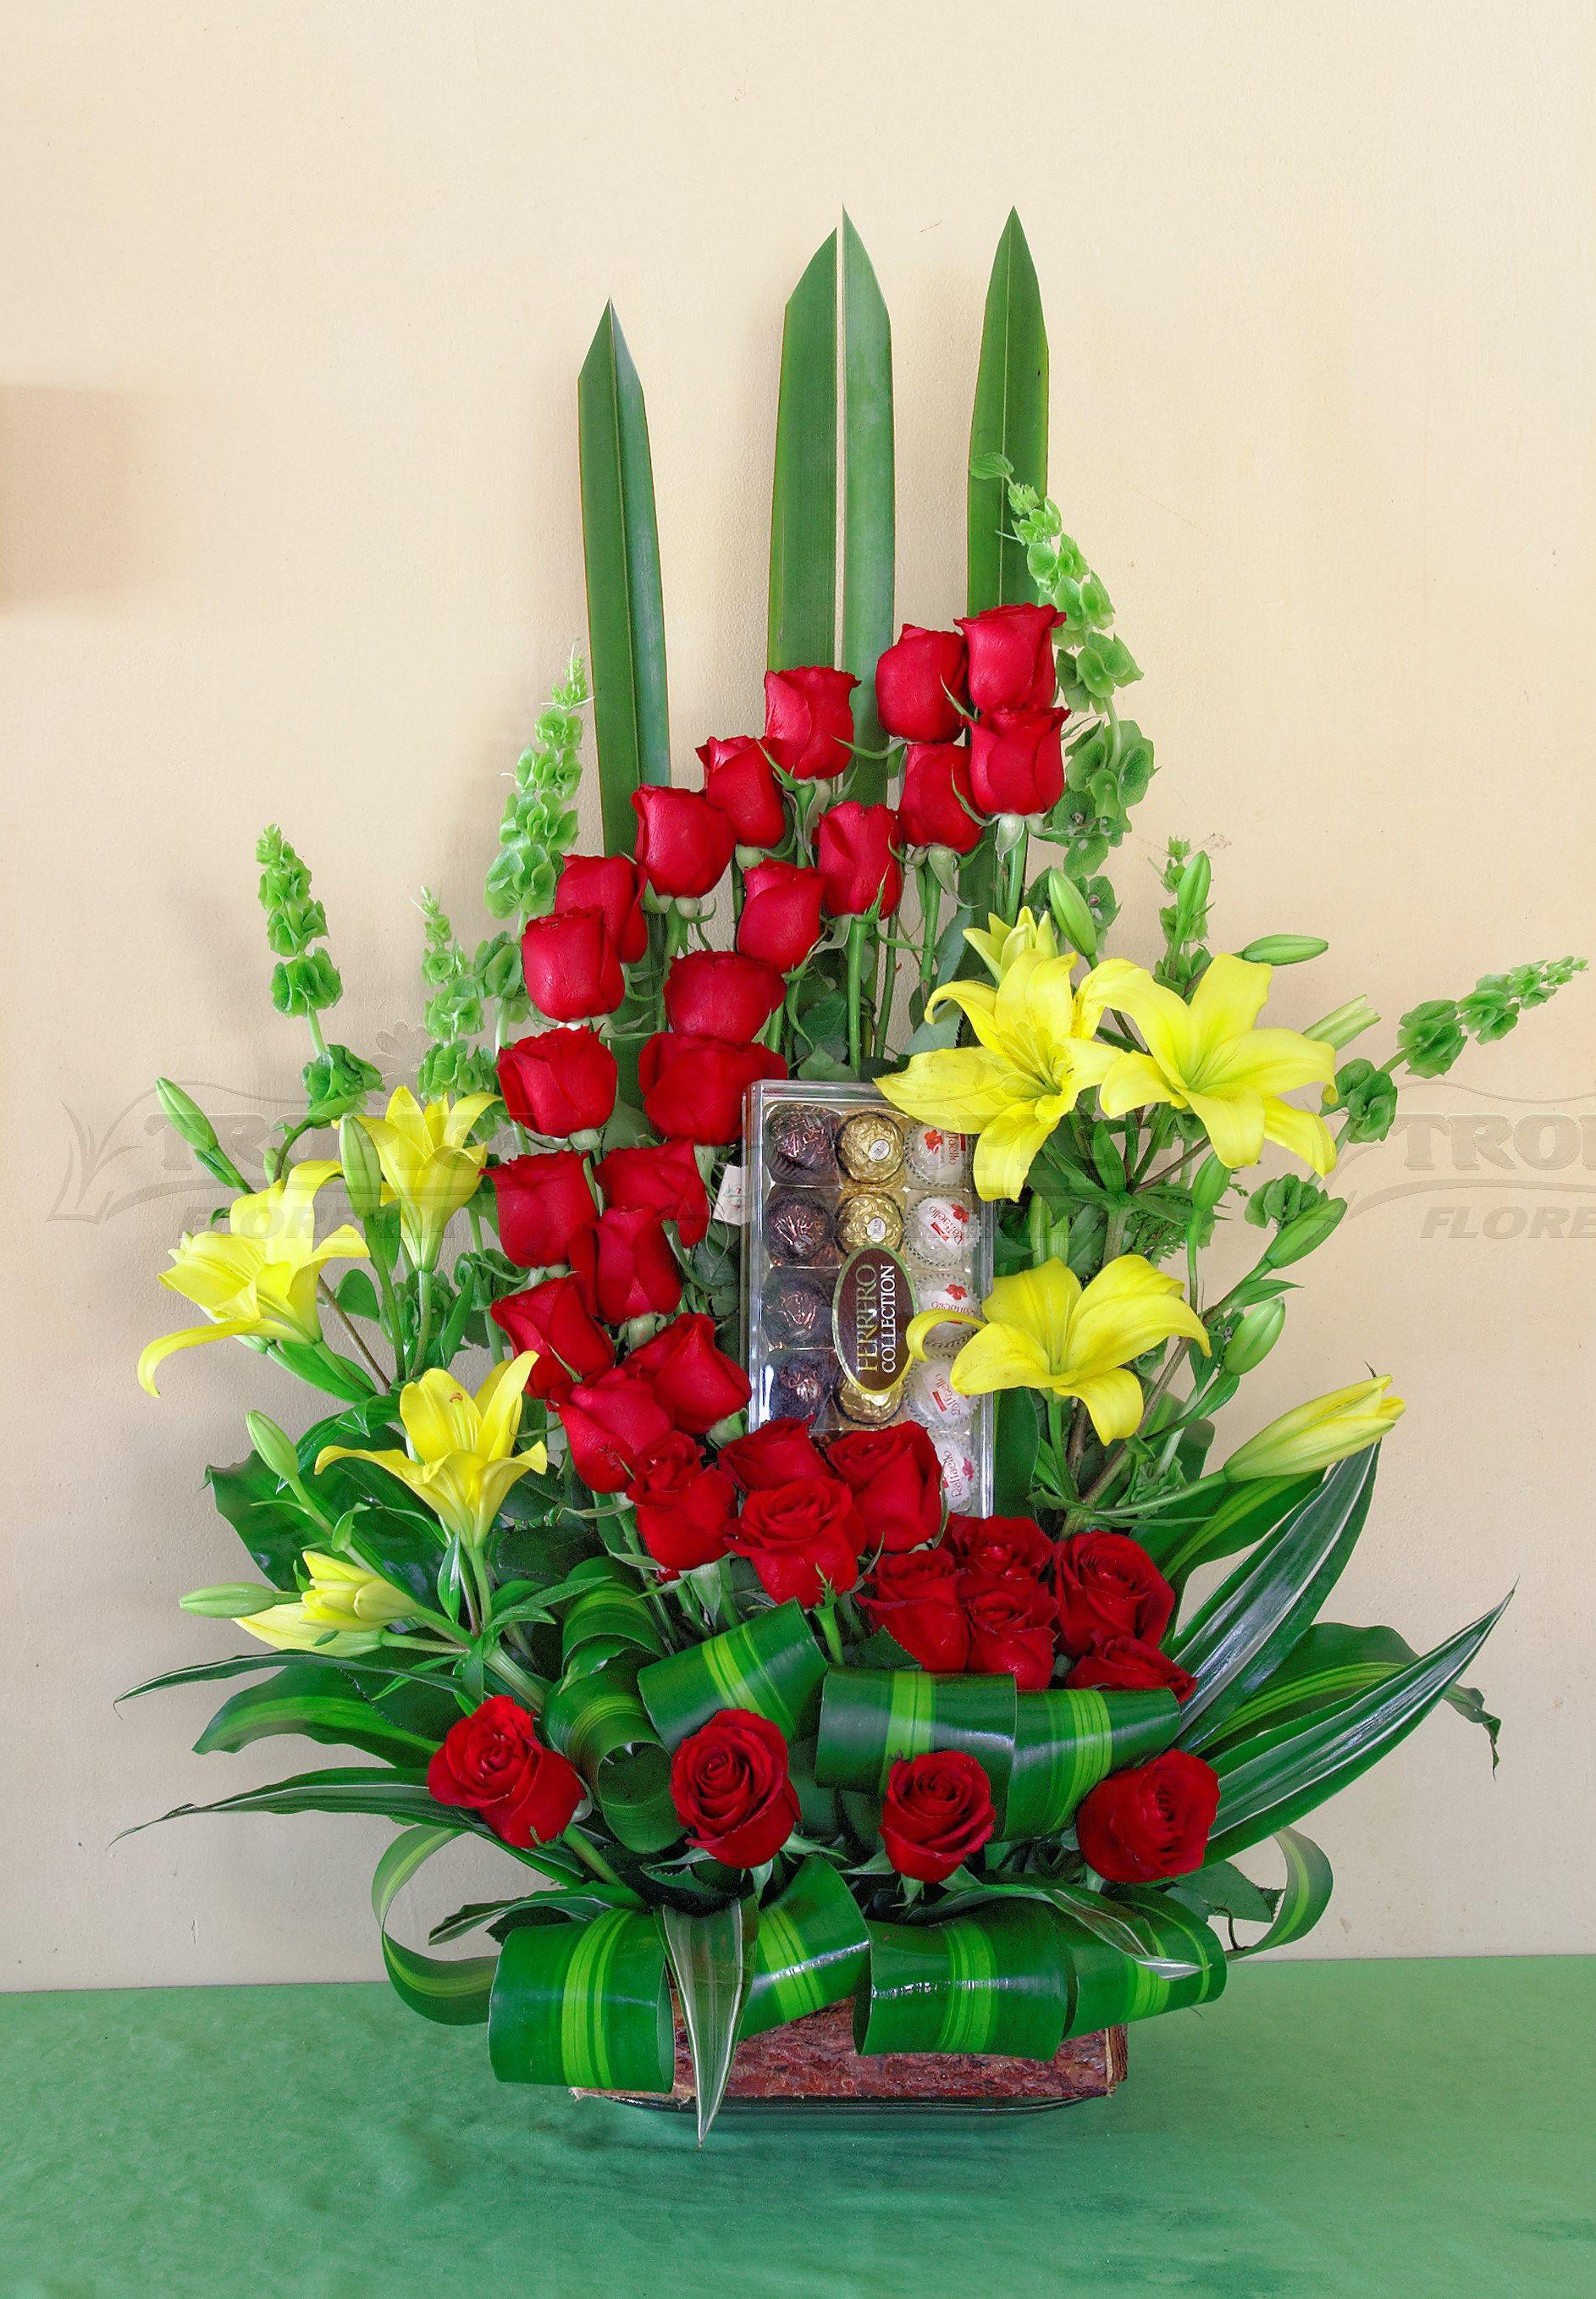 Pin de IRMA YOLANDA en flores para el santisimo | Pinterest ...